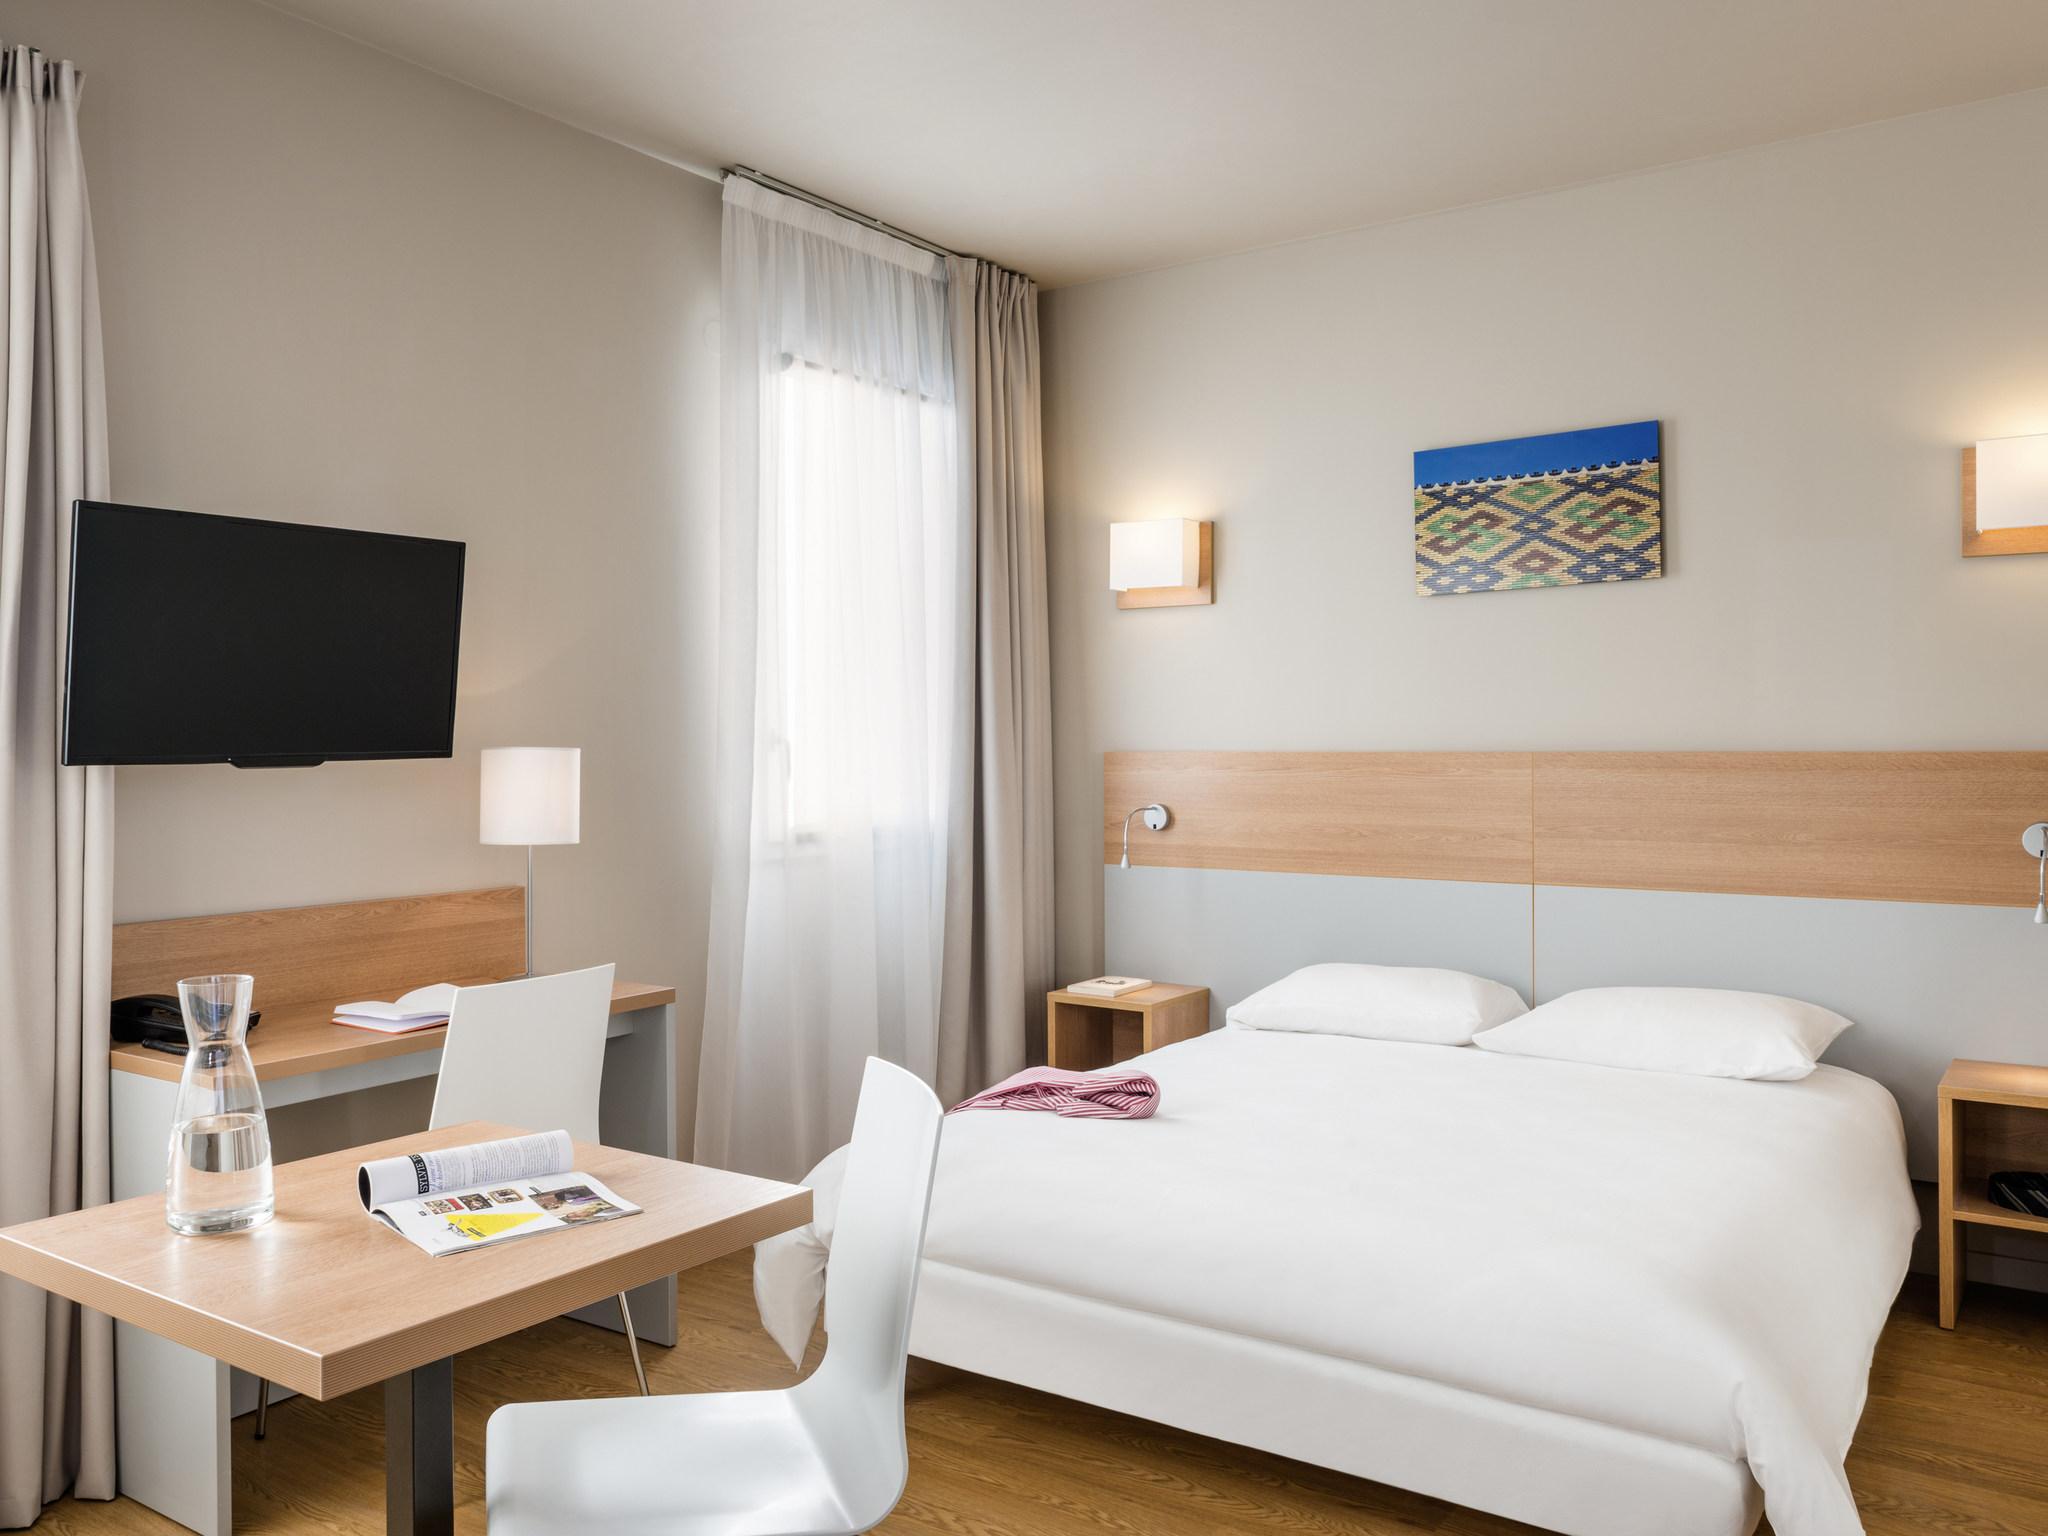 Hôtel - Aparthotel Adagio access Dijon République